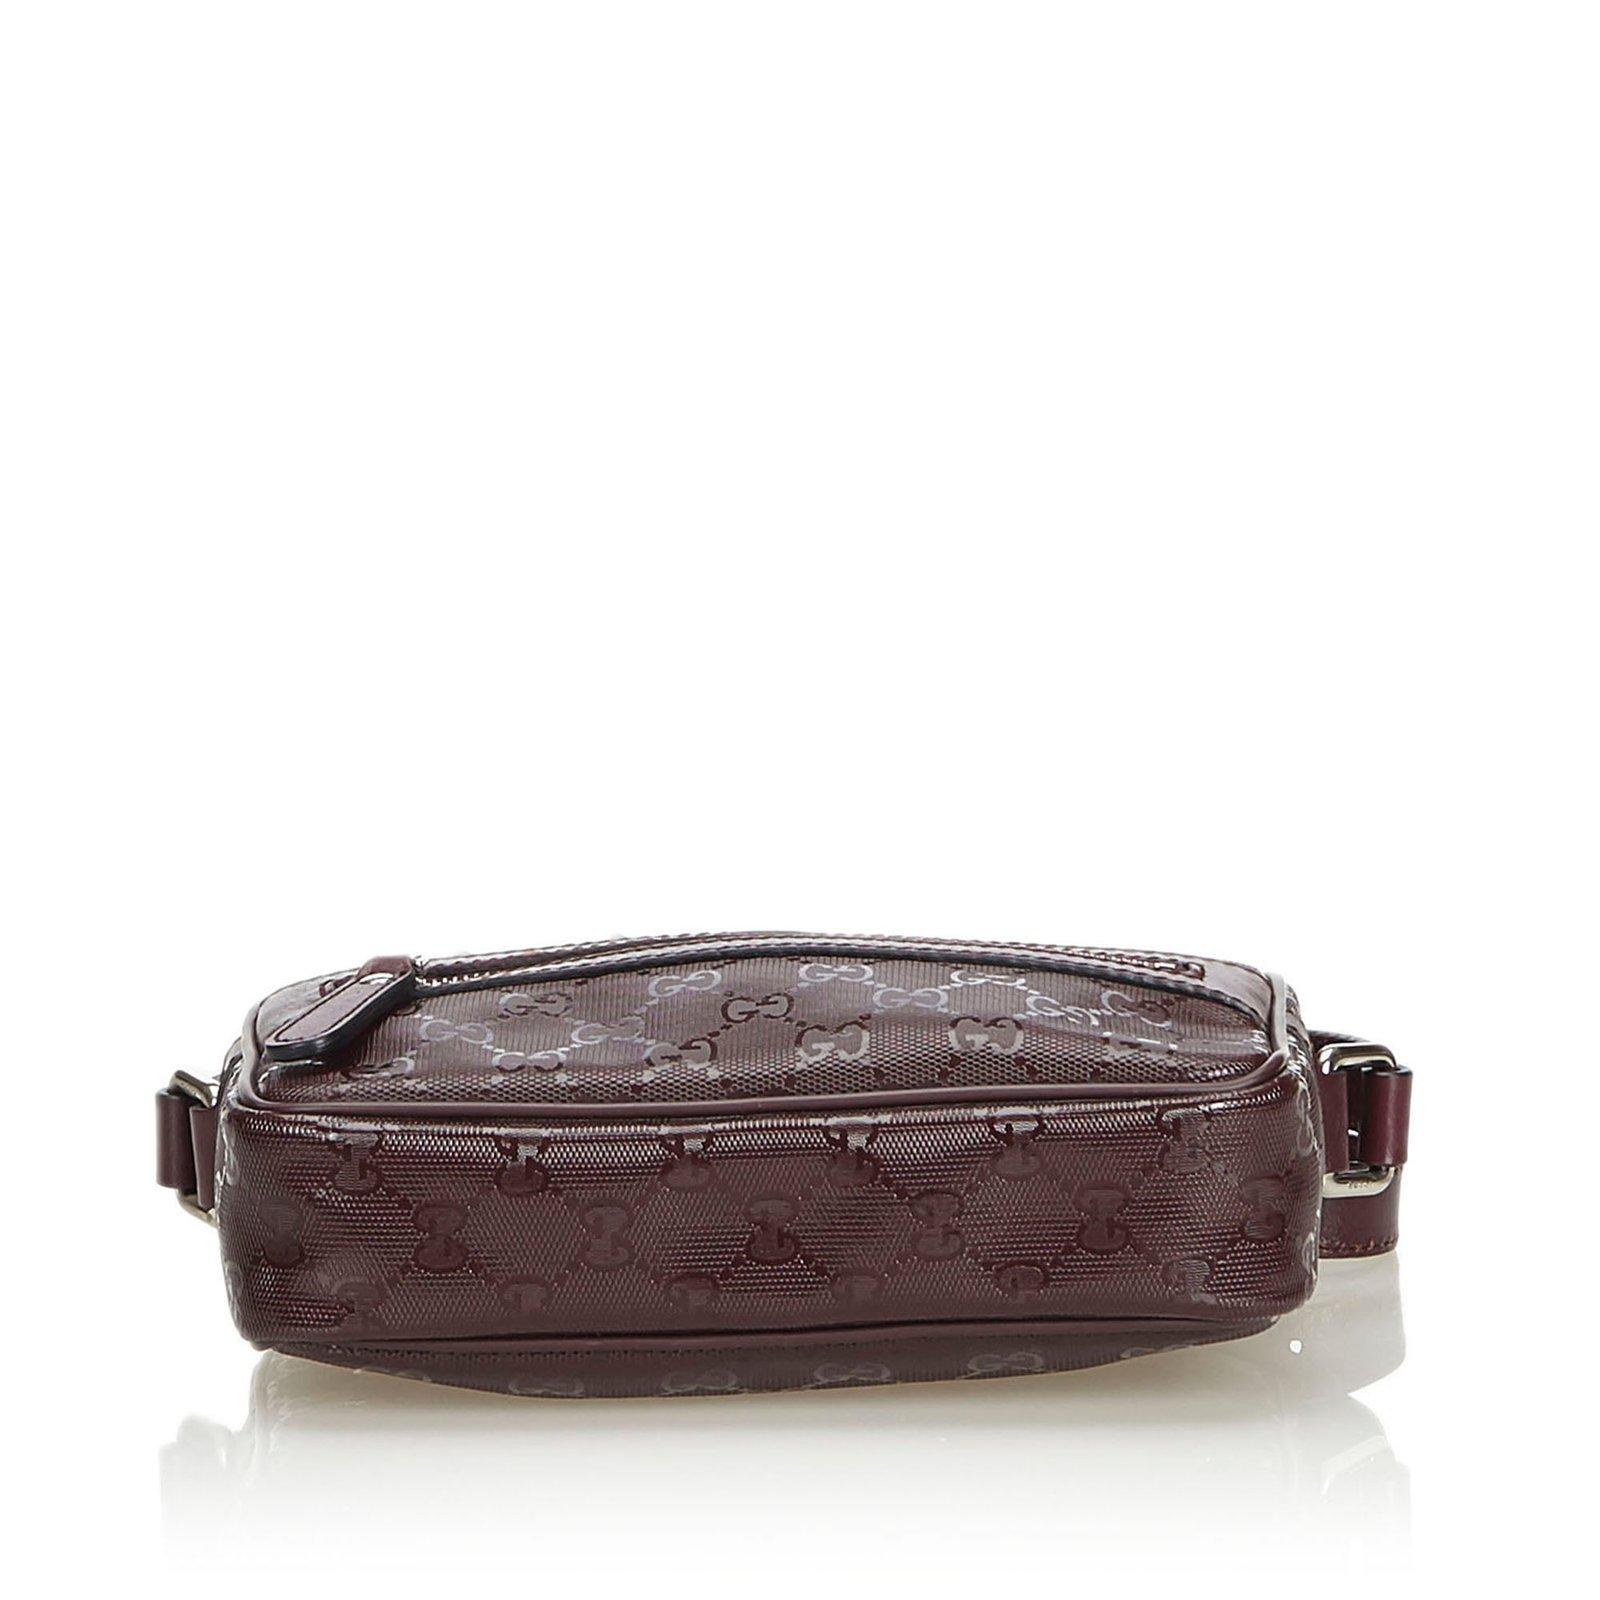 0e6aa4b65e1f Gucci GG Imprime Crossbody Bag Handbags Leather,Other,Plastic Brown  ref.106057 - Joli Closet